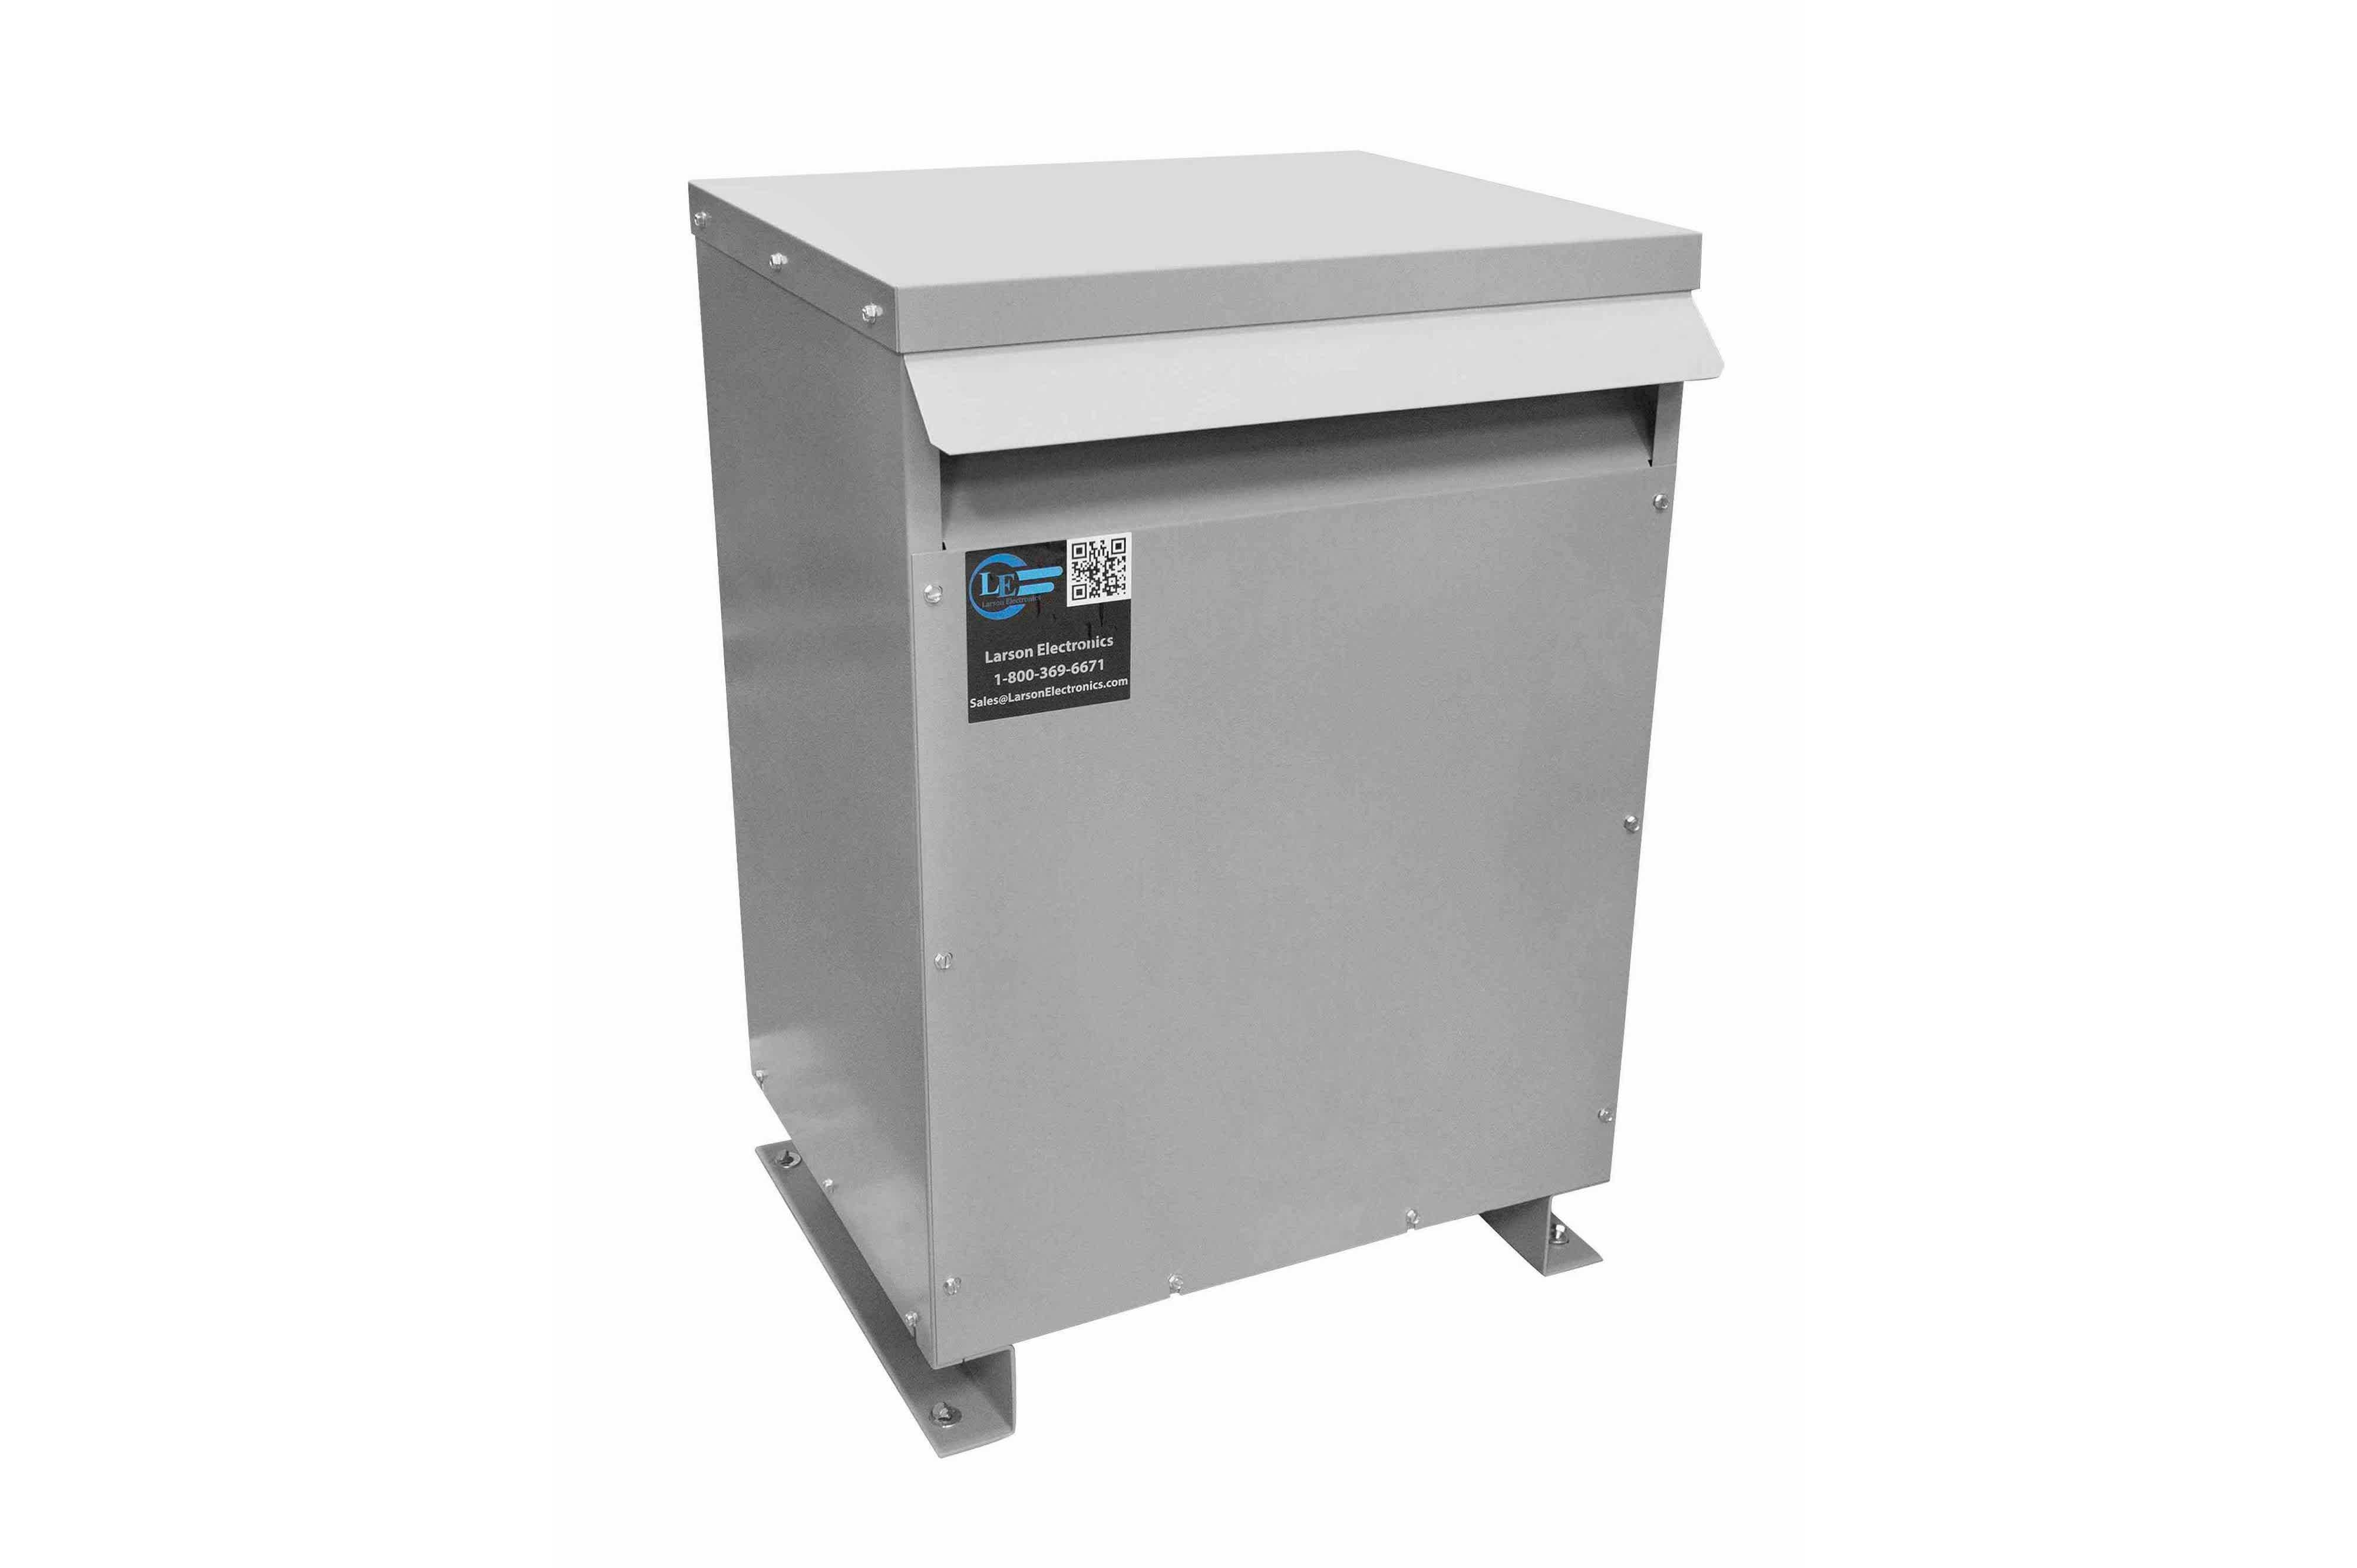 47.5 kVA 3PH Isolation Transformer, 460V Wye Primary, 240V Delta Secondary, N3R, Ventilated, 60 Hz